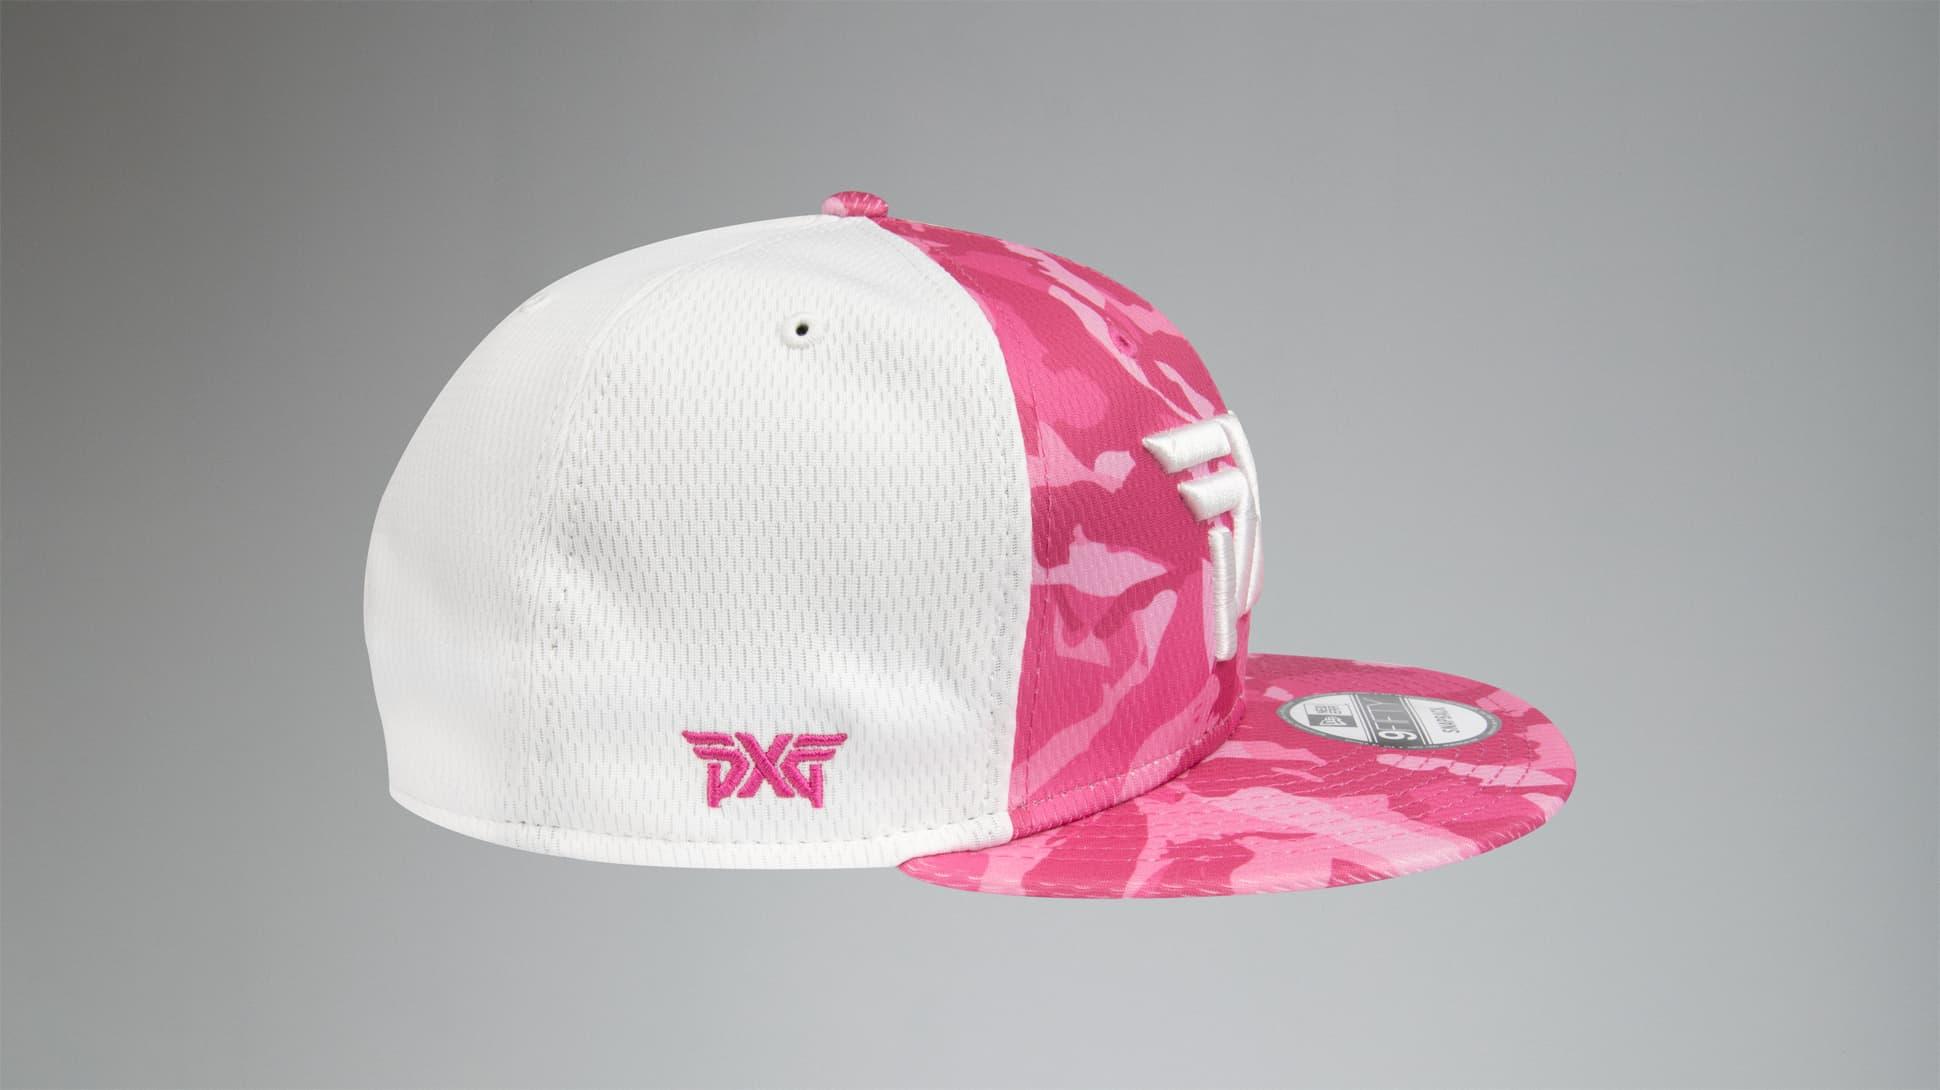 Fairway Camo™ Pink 9FIFTY Snapback Cap Image 4